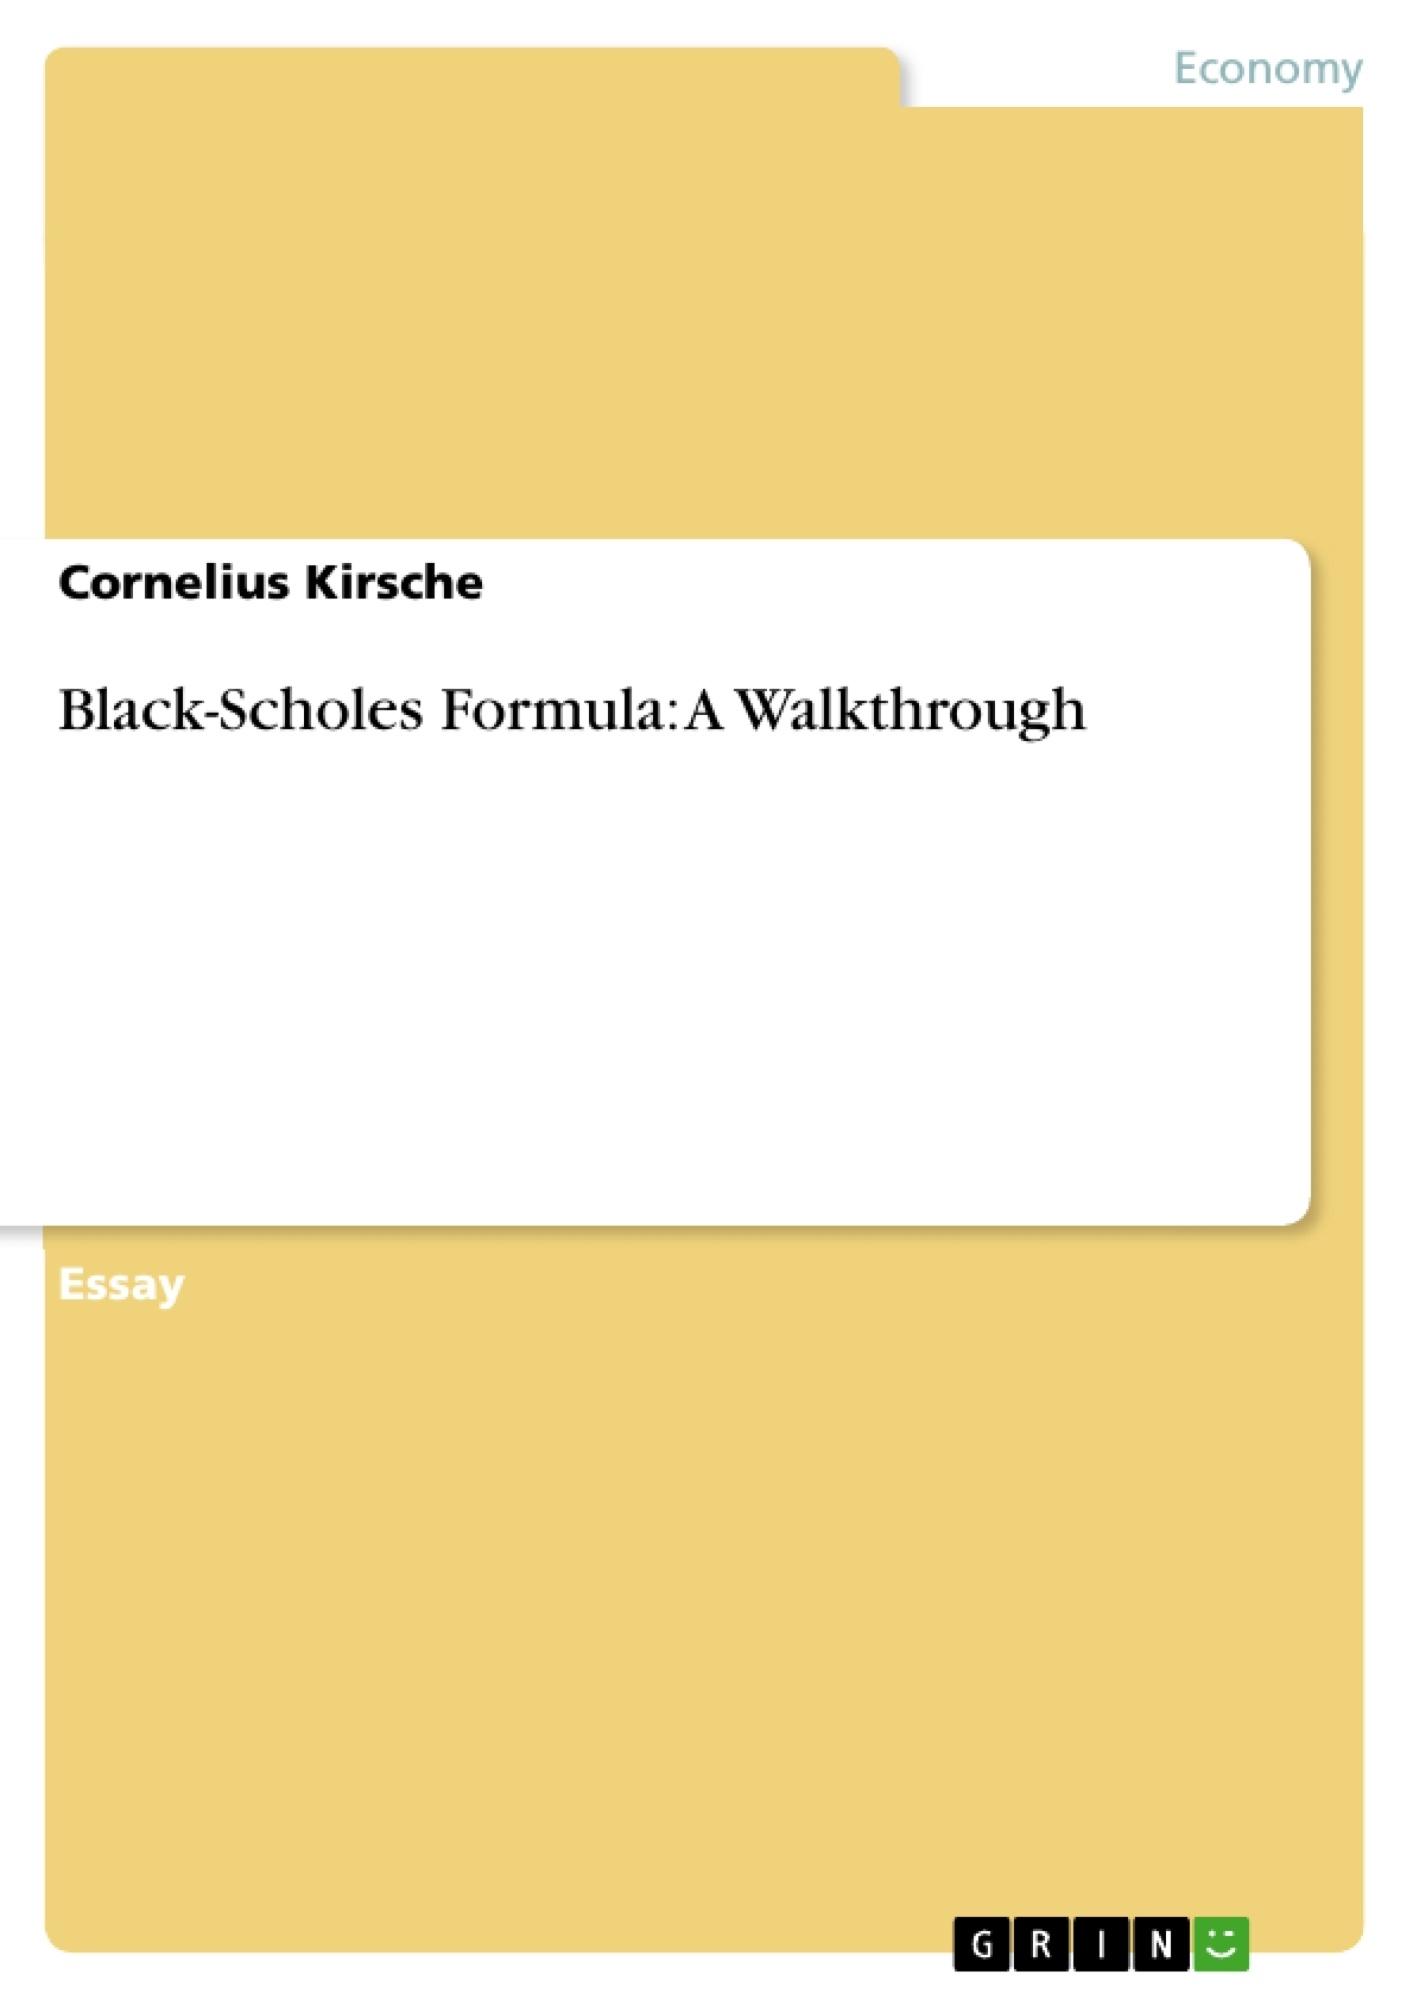 Title: Black-Scholes Formula: A Walkthrough